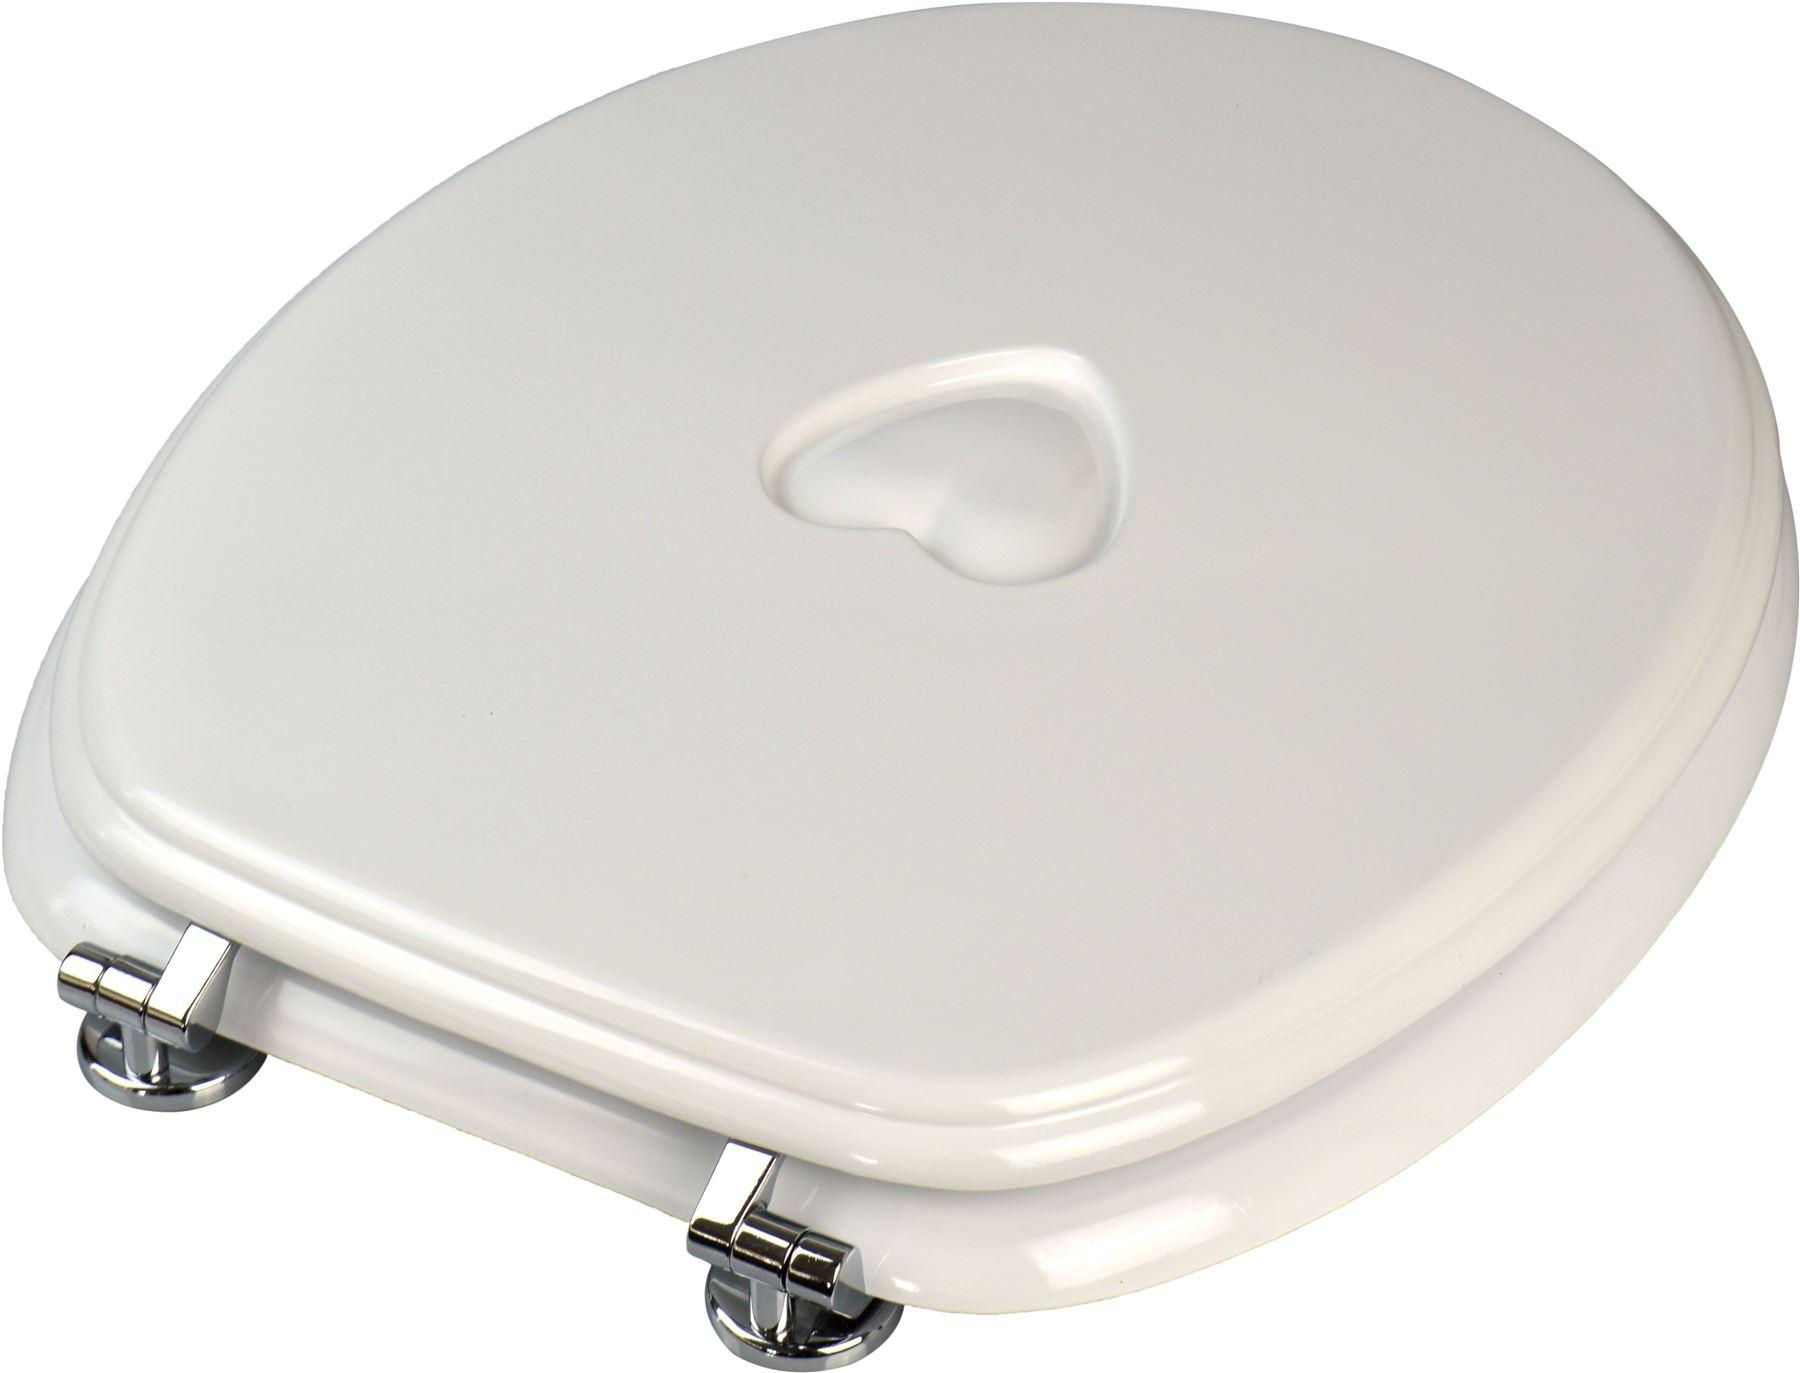 White Wooden Bathroom Toilet Seat Heart Design Fixings Included EBay